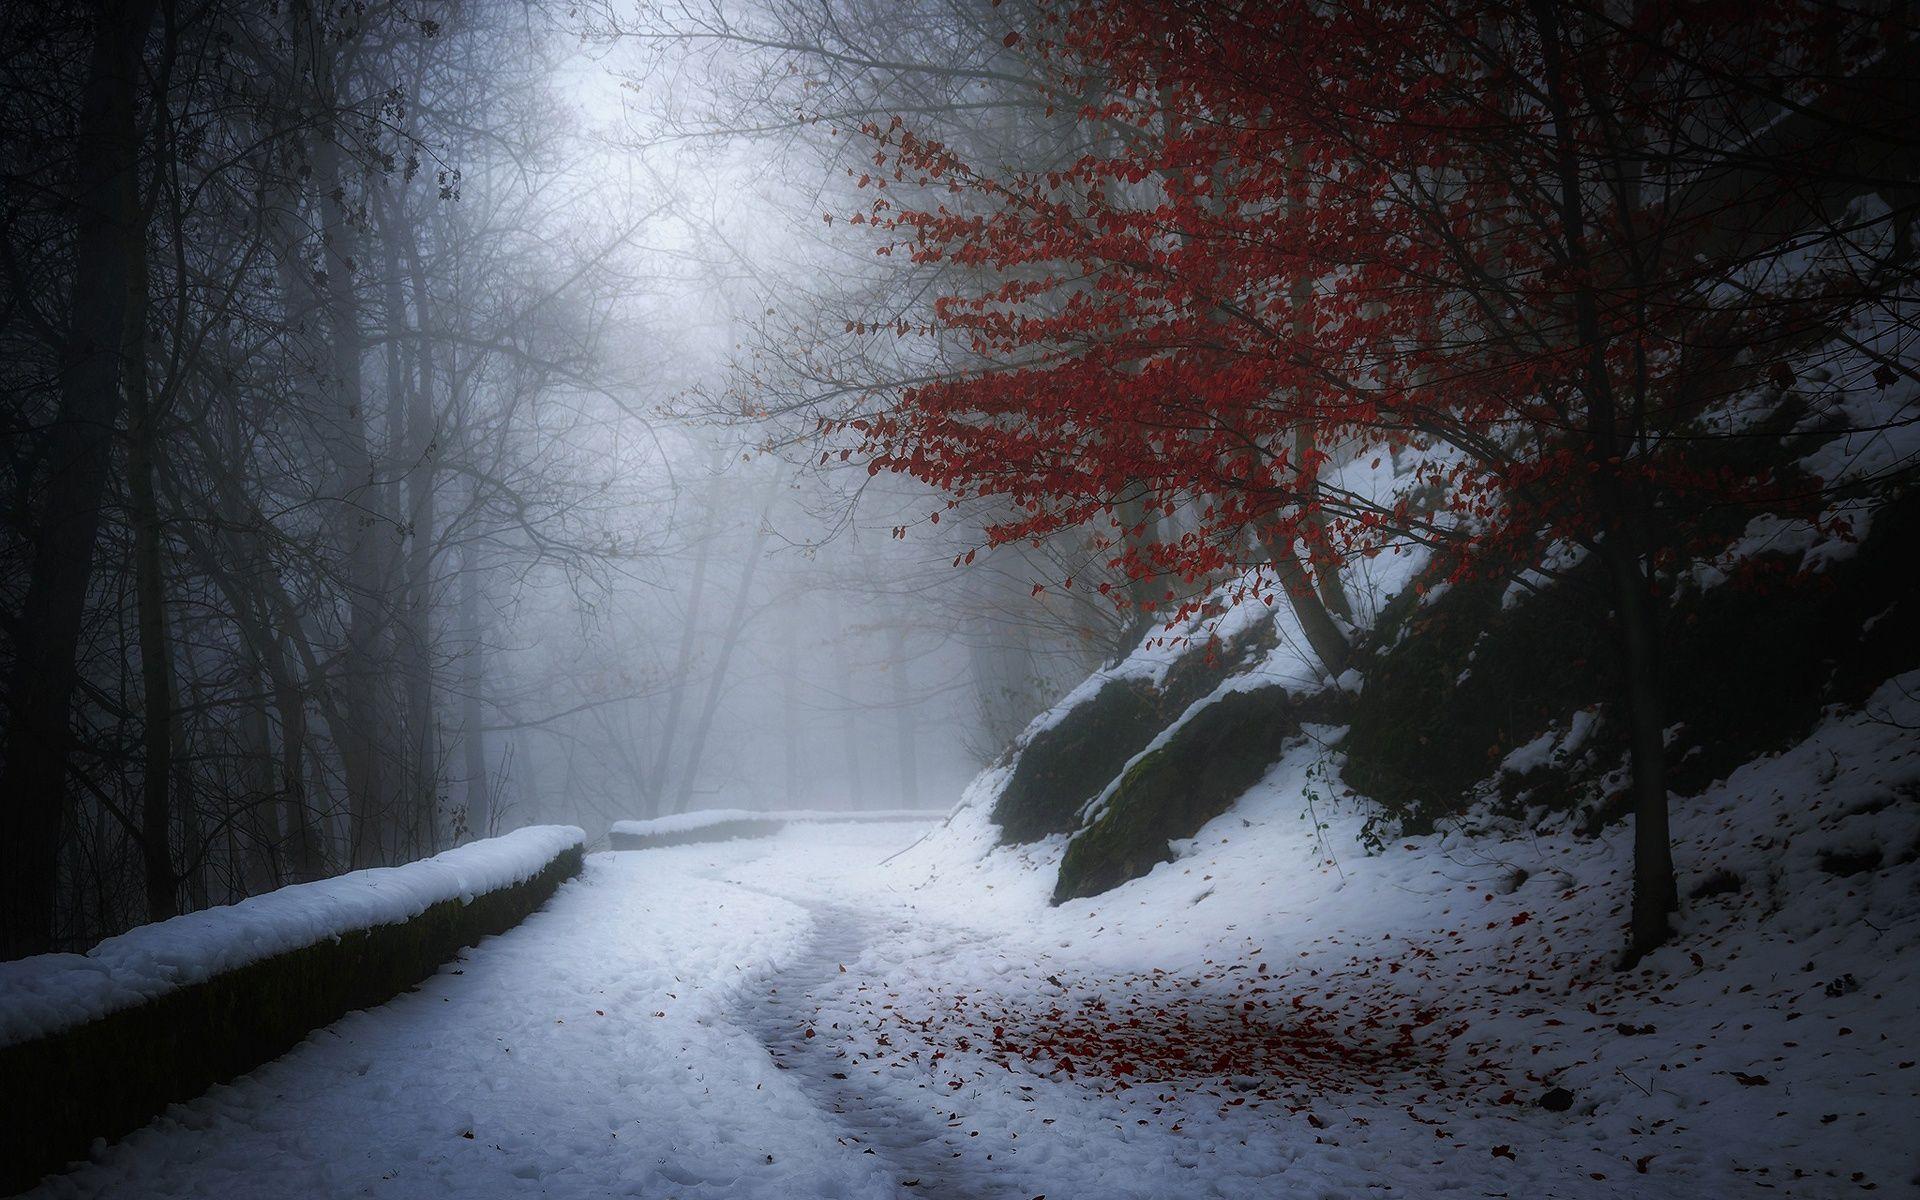 Hd free wallpaper winter scene d wallpapers pinterest d